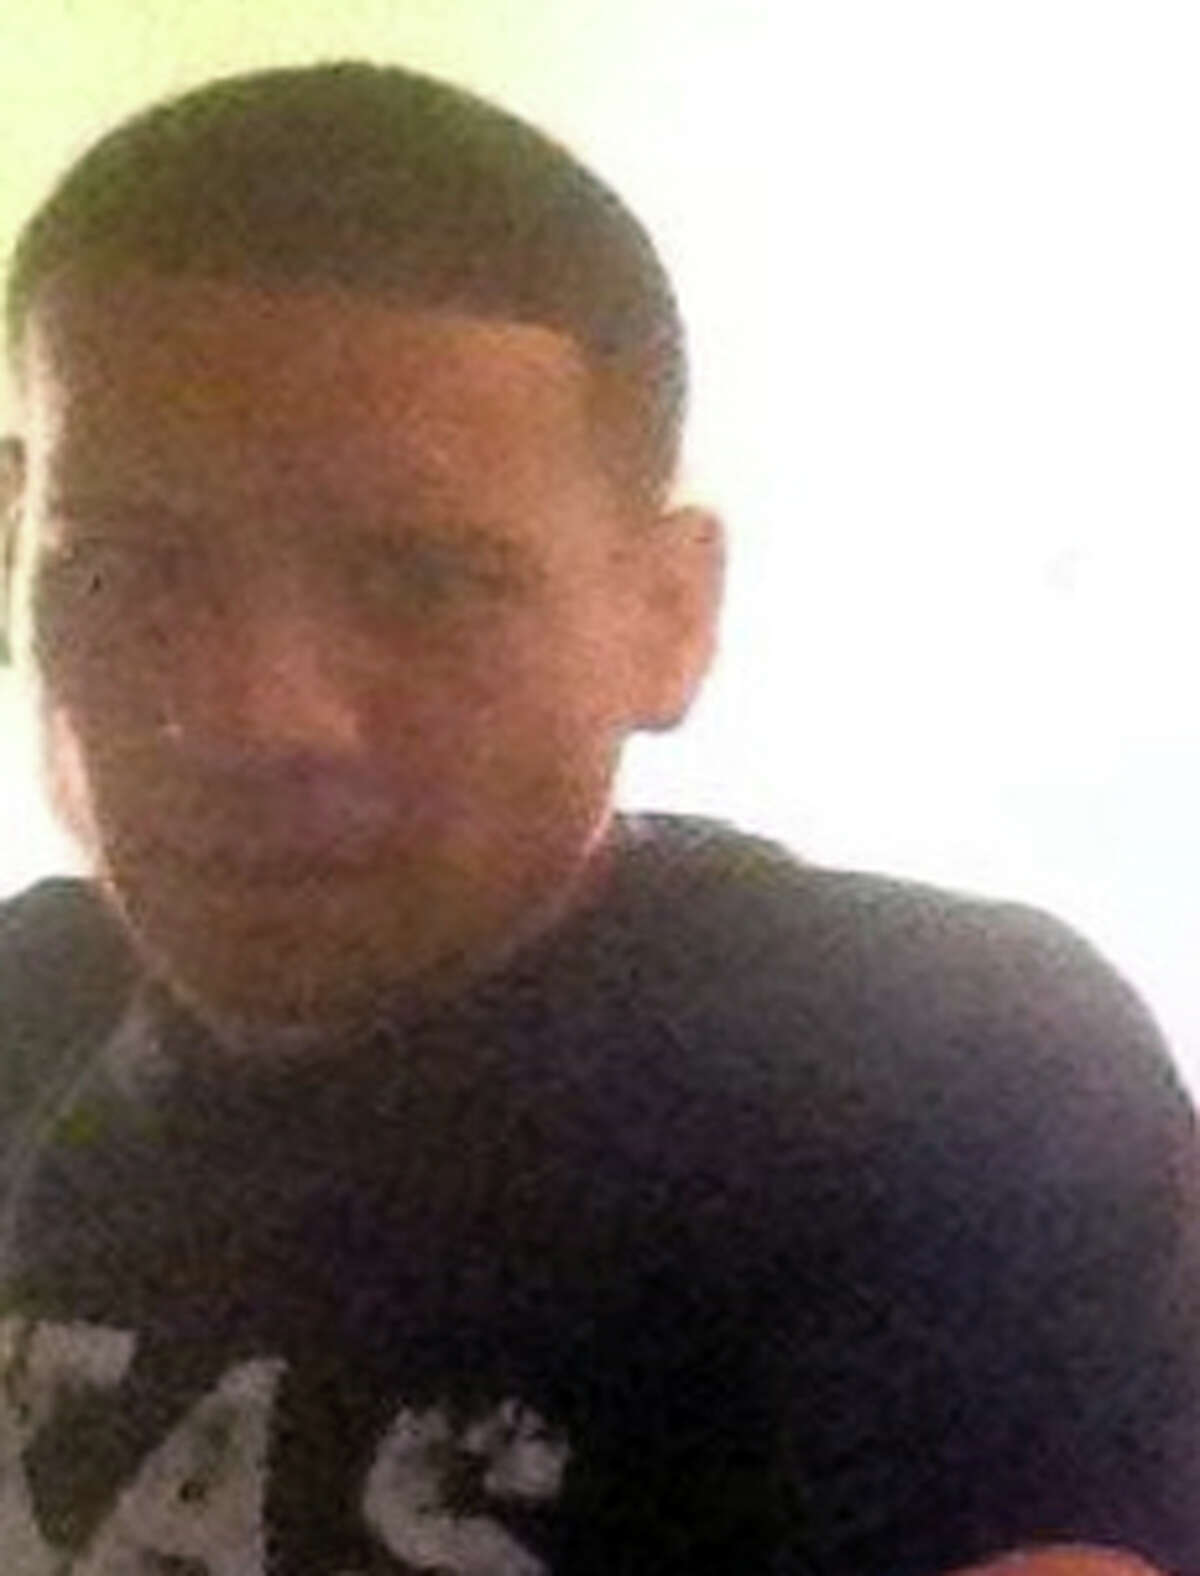 Daniel Cruz, AKA Jose Luis Cruz (Stafford Police Department)